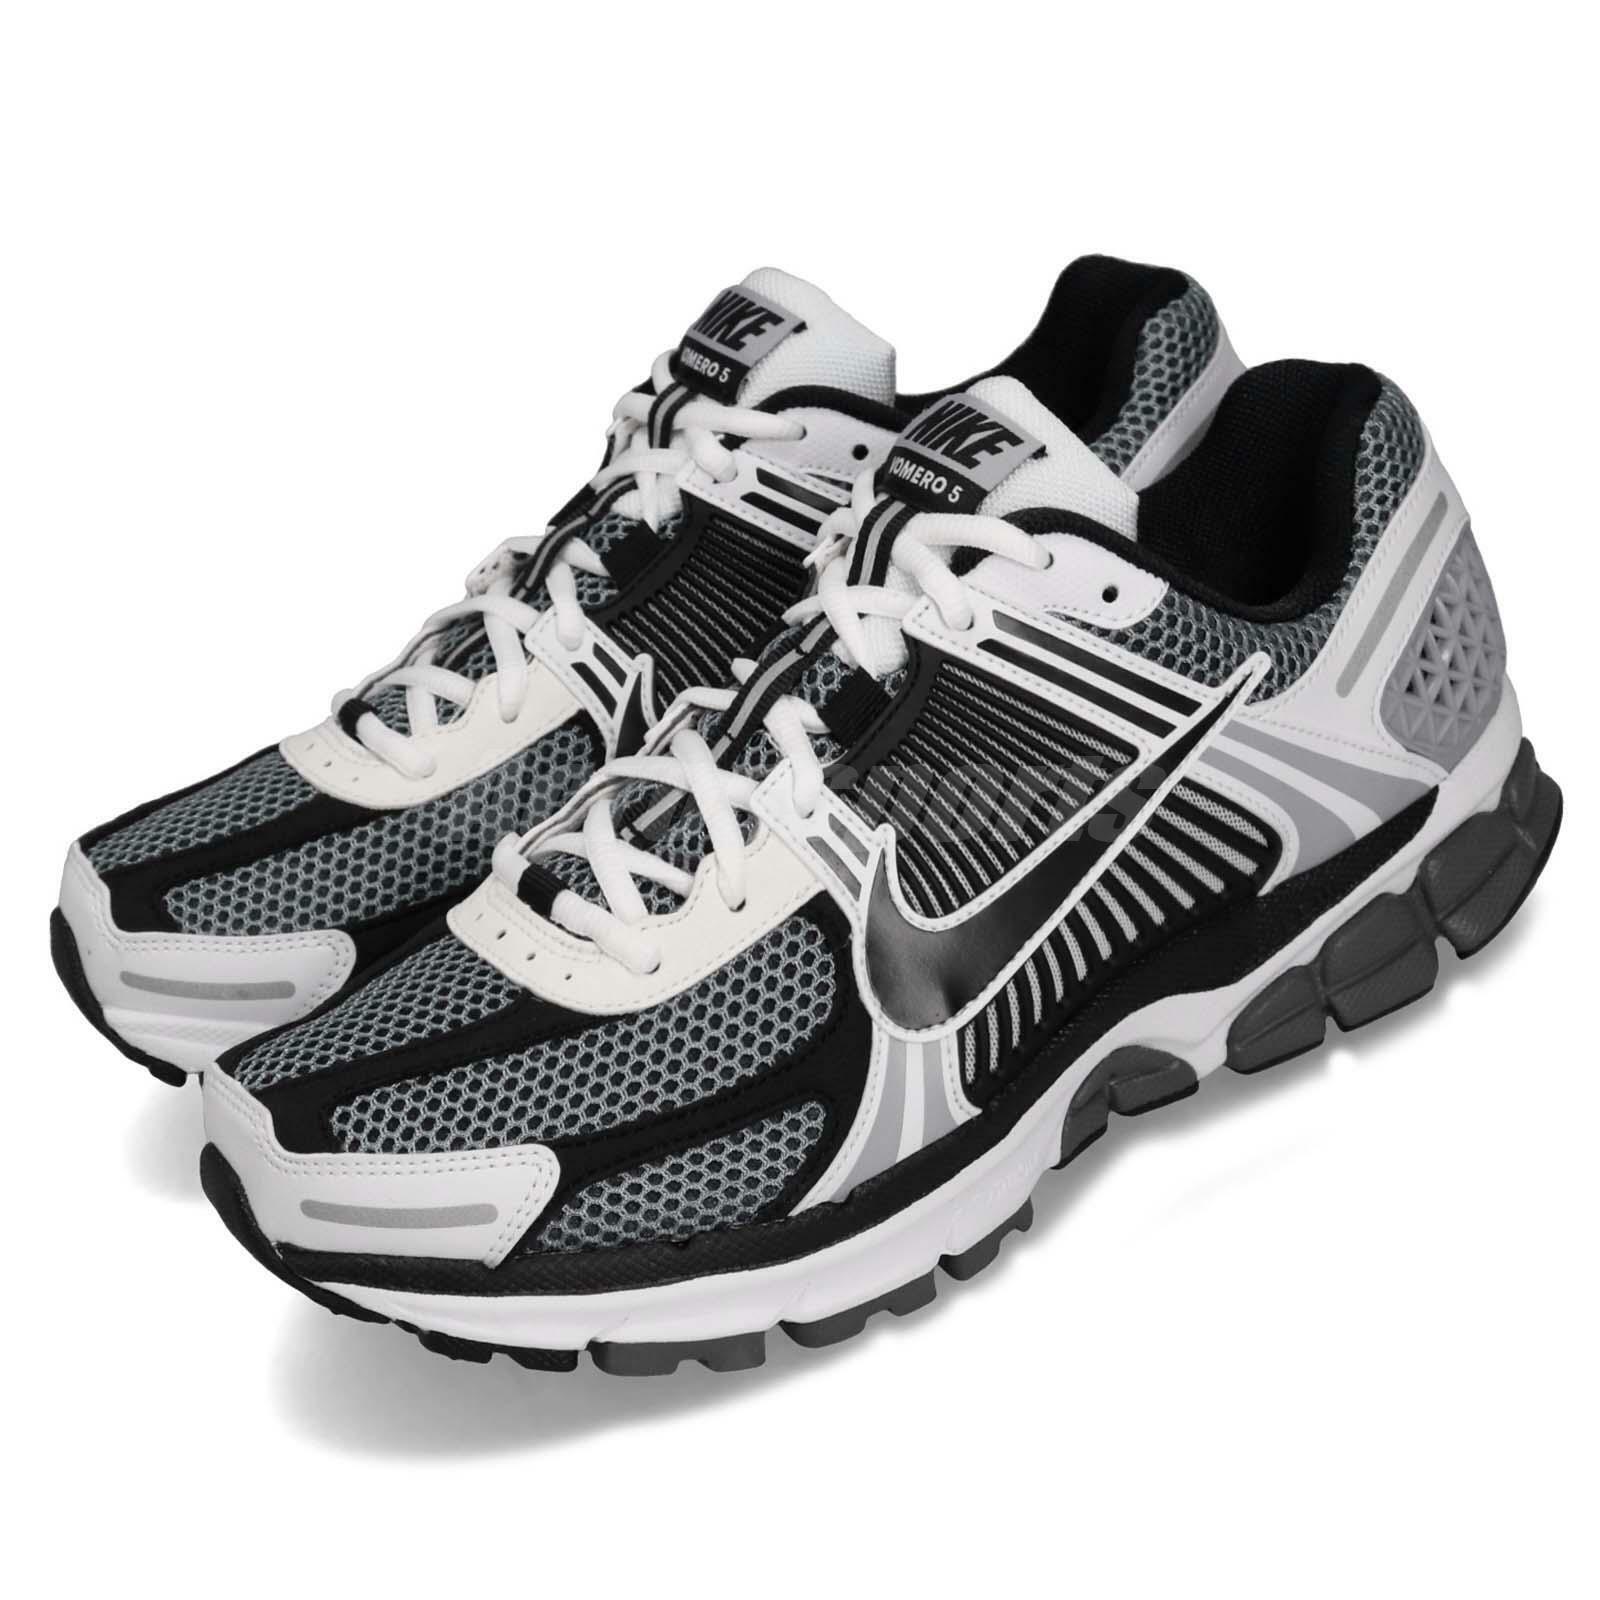 Nike Zoom Vomero 5 SE SP V Dark grigio nero Men Running scarpe scarpe da ginnastica CI1694-001